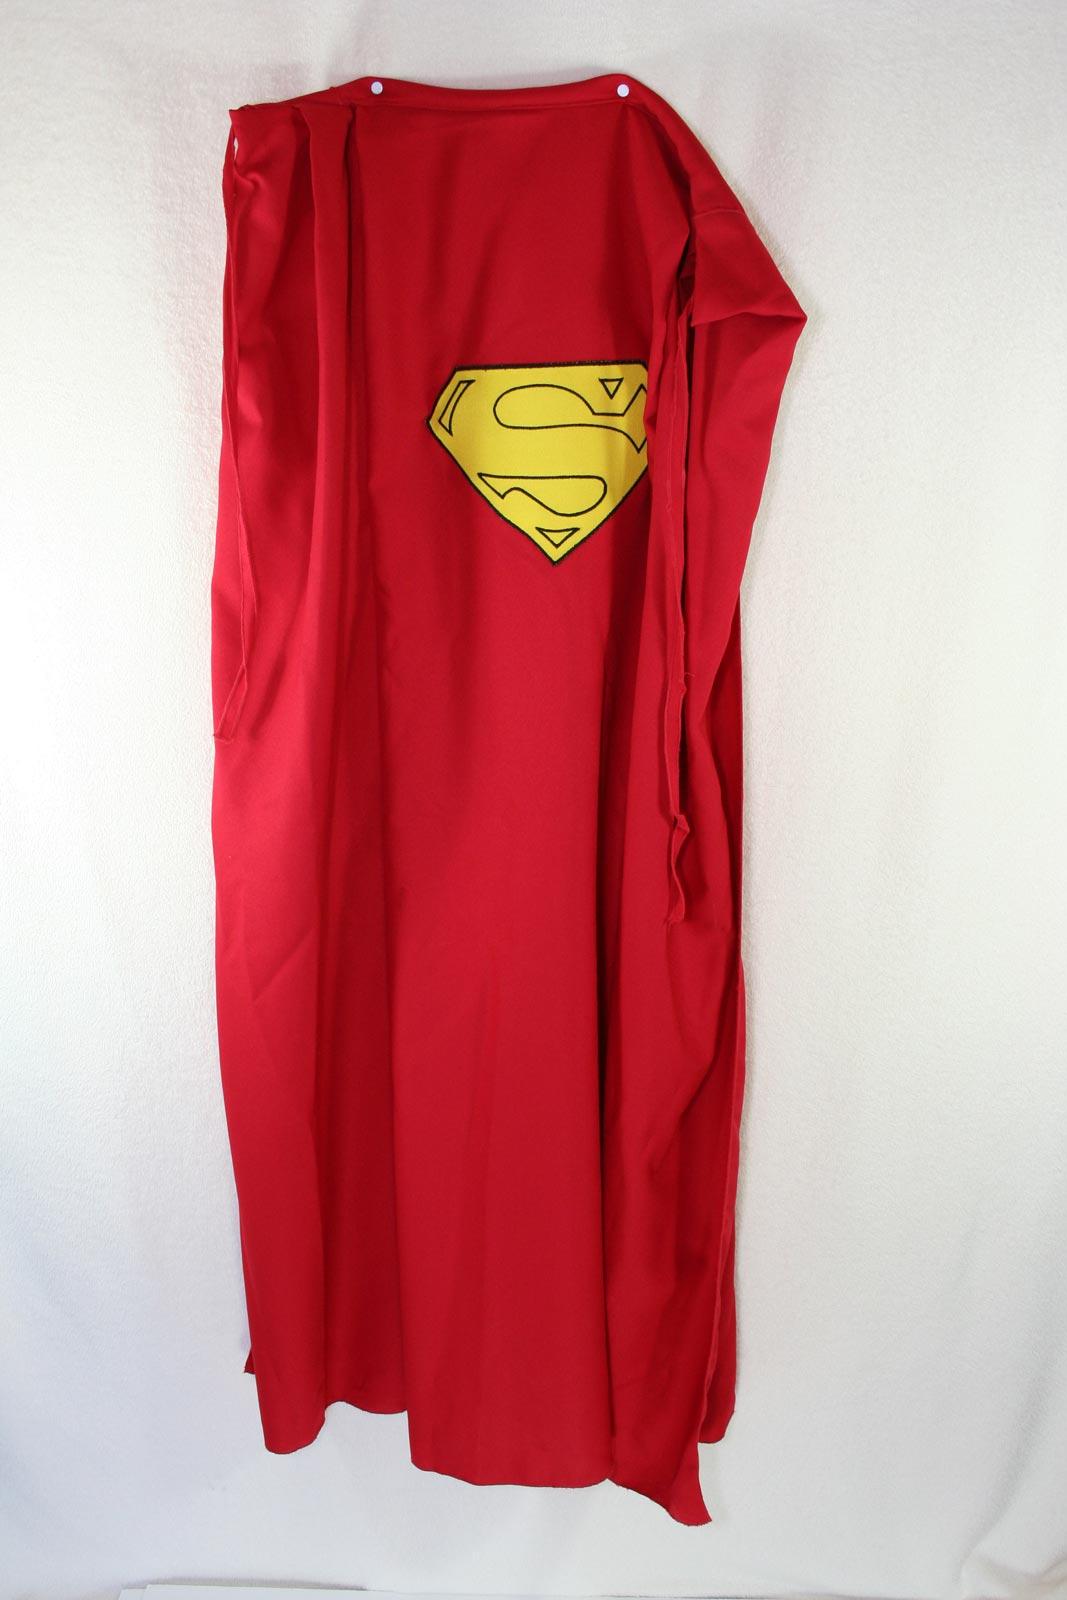 Http Galleryhip Com Superman Cape Images Html